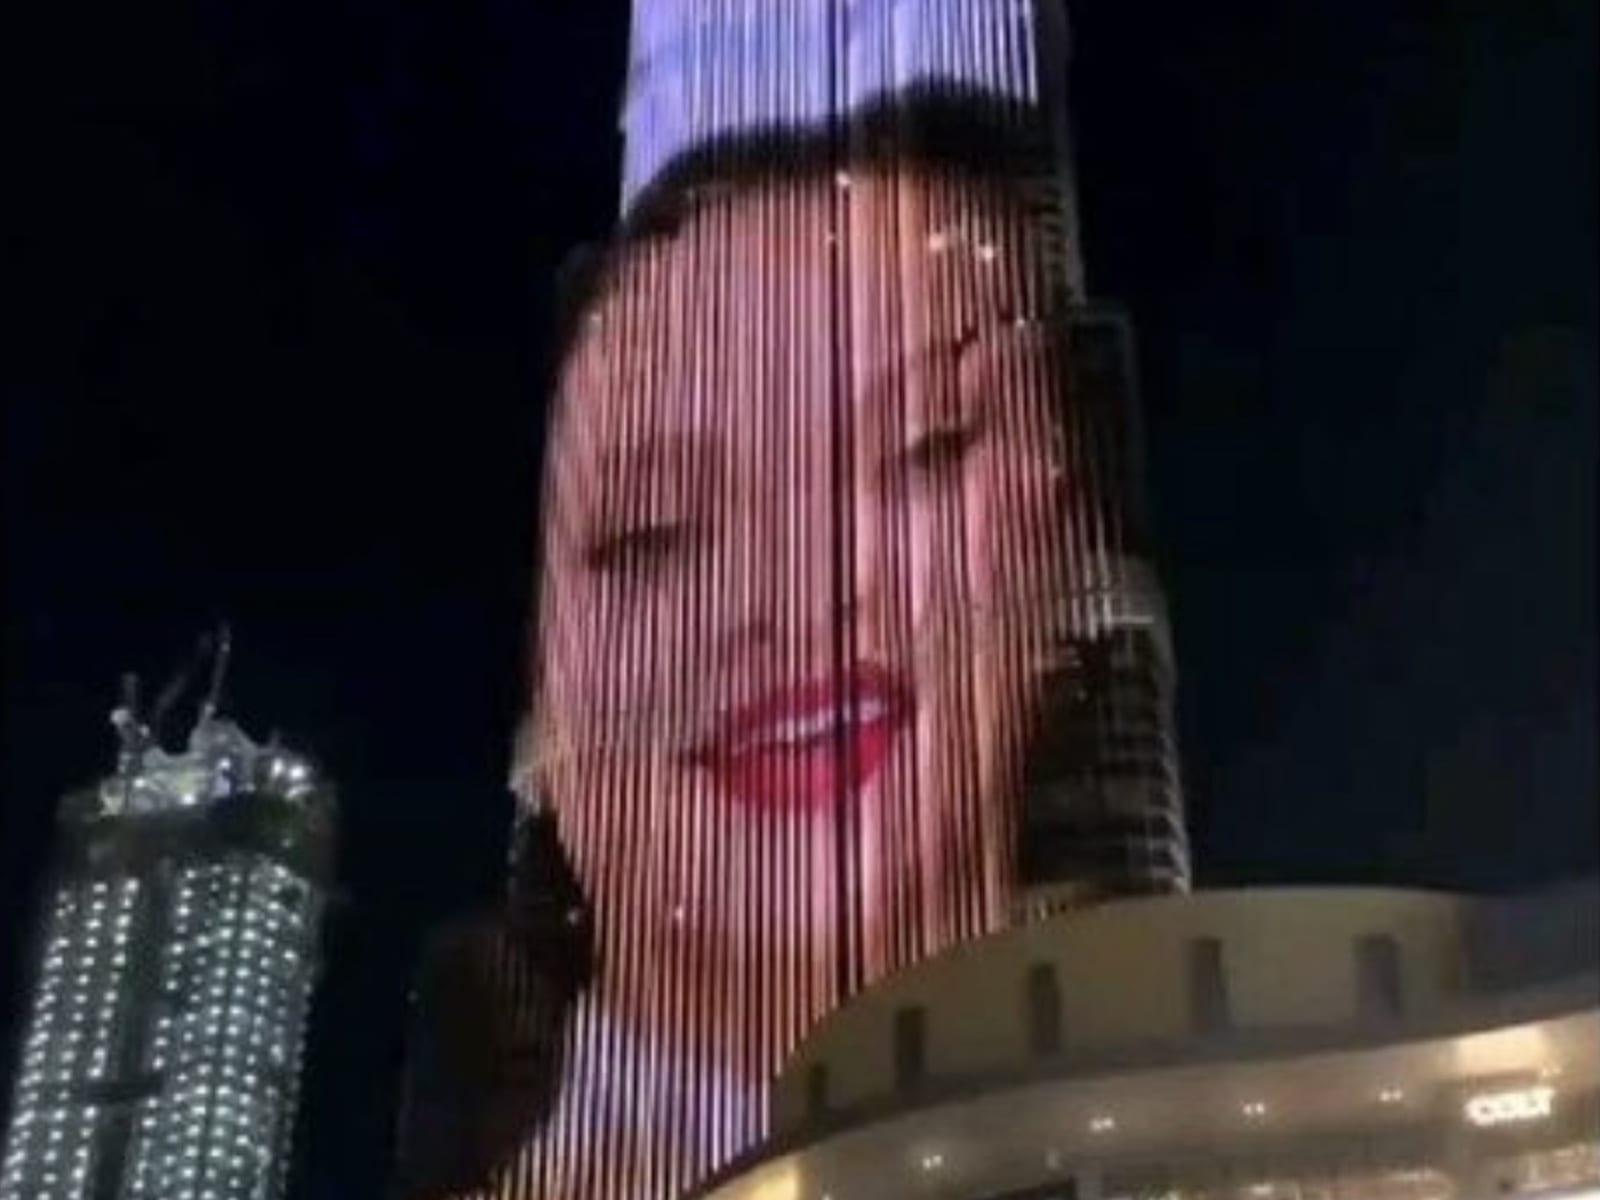 Rihanna's Massive Fenty Skin Building Announcement Turns Into A Savage Meme